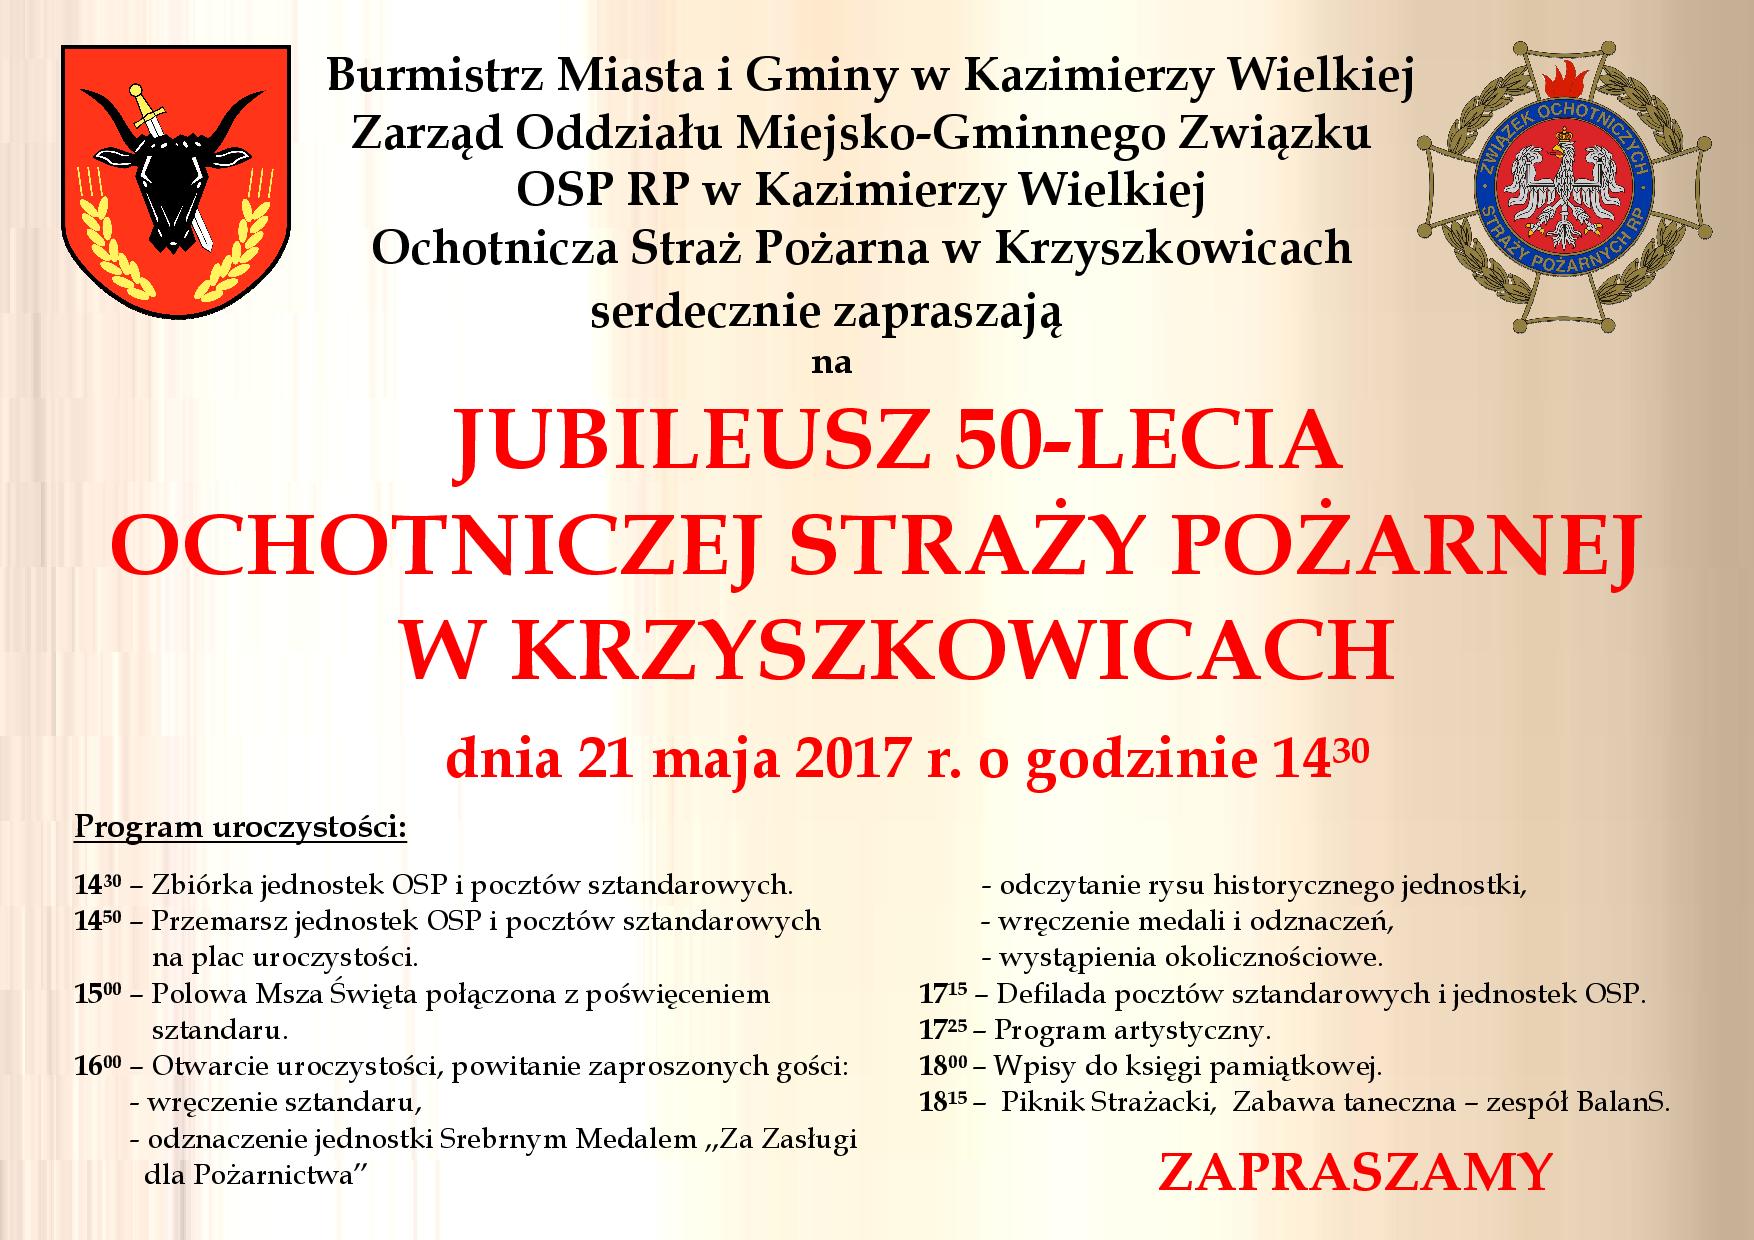 - plakat_jubileusz_osp_wlasciwy.png